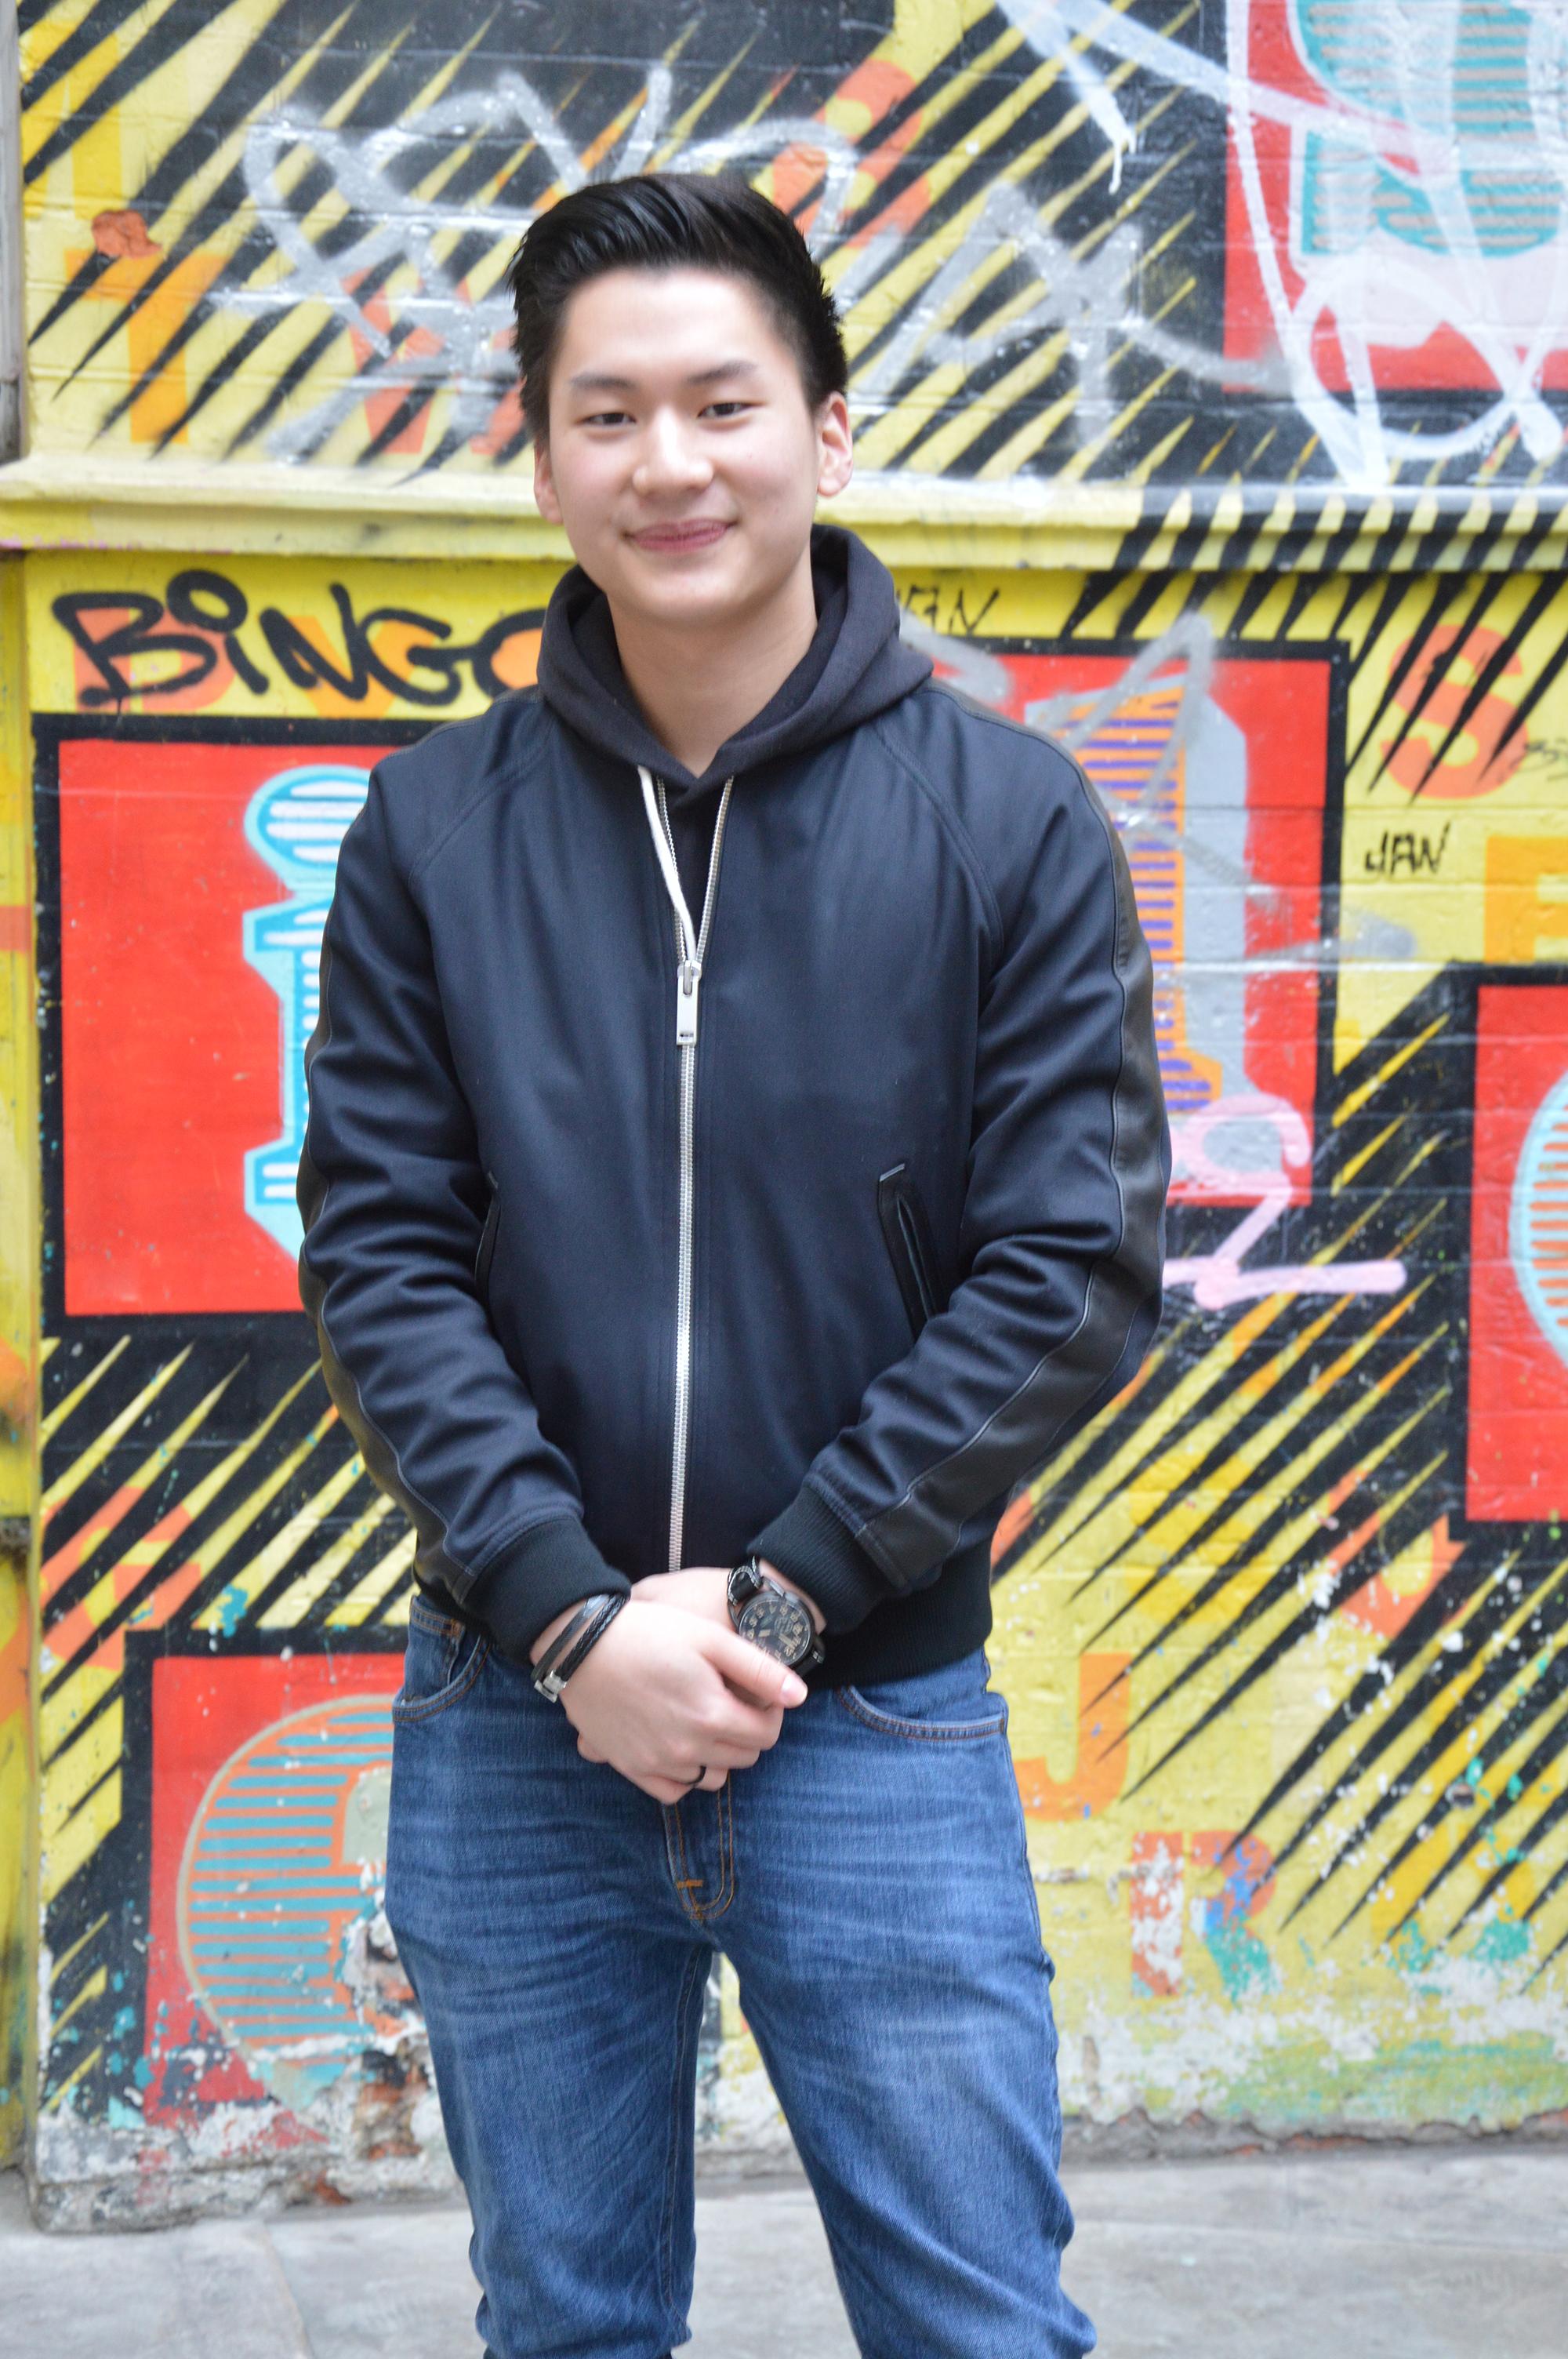 Photo of international student Chayapol at INTO London